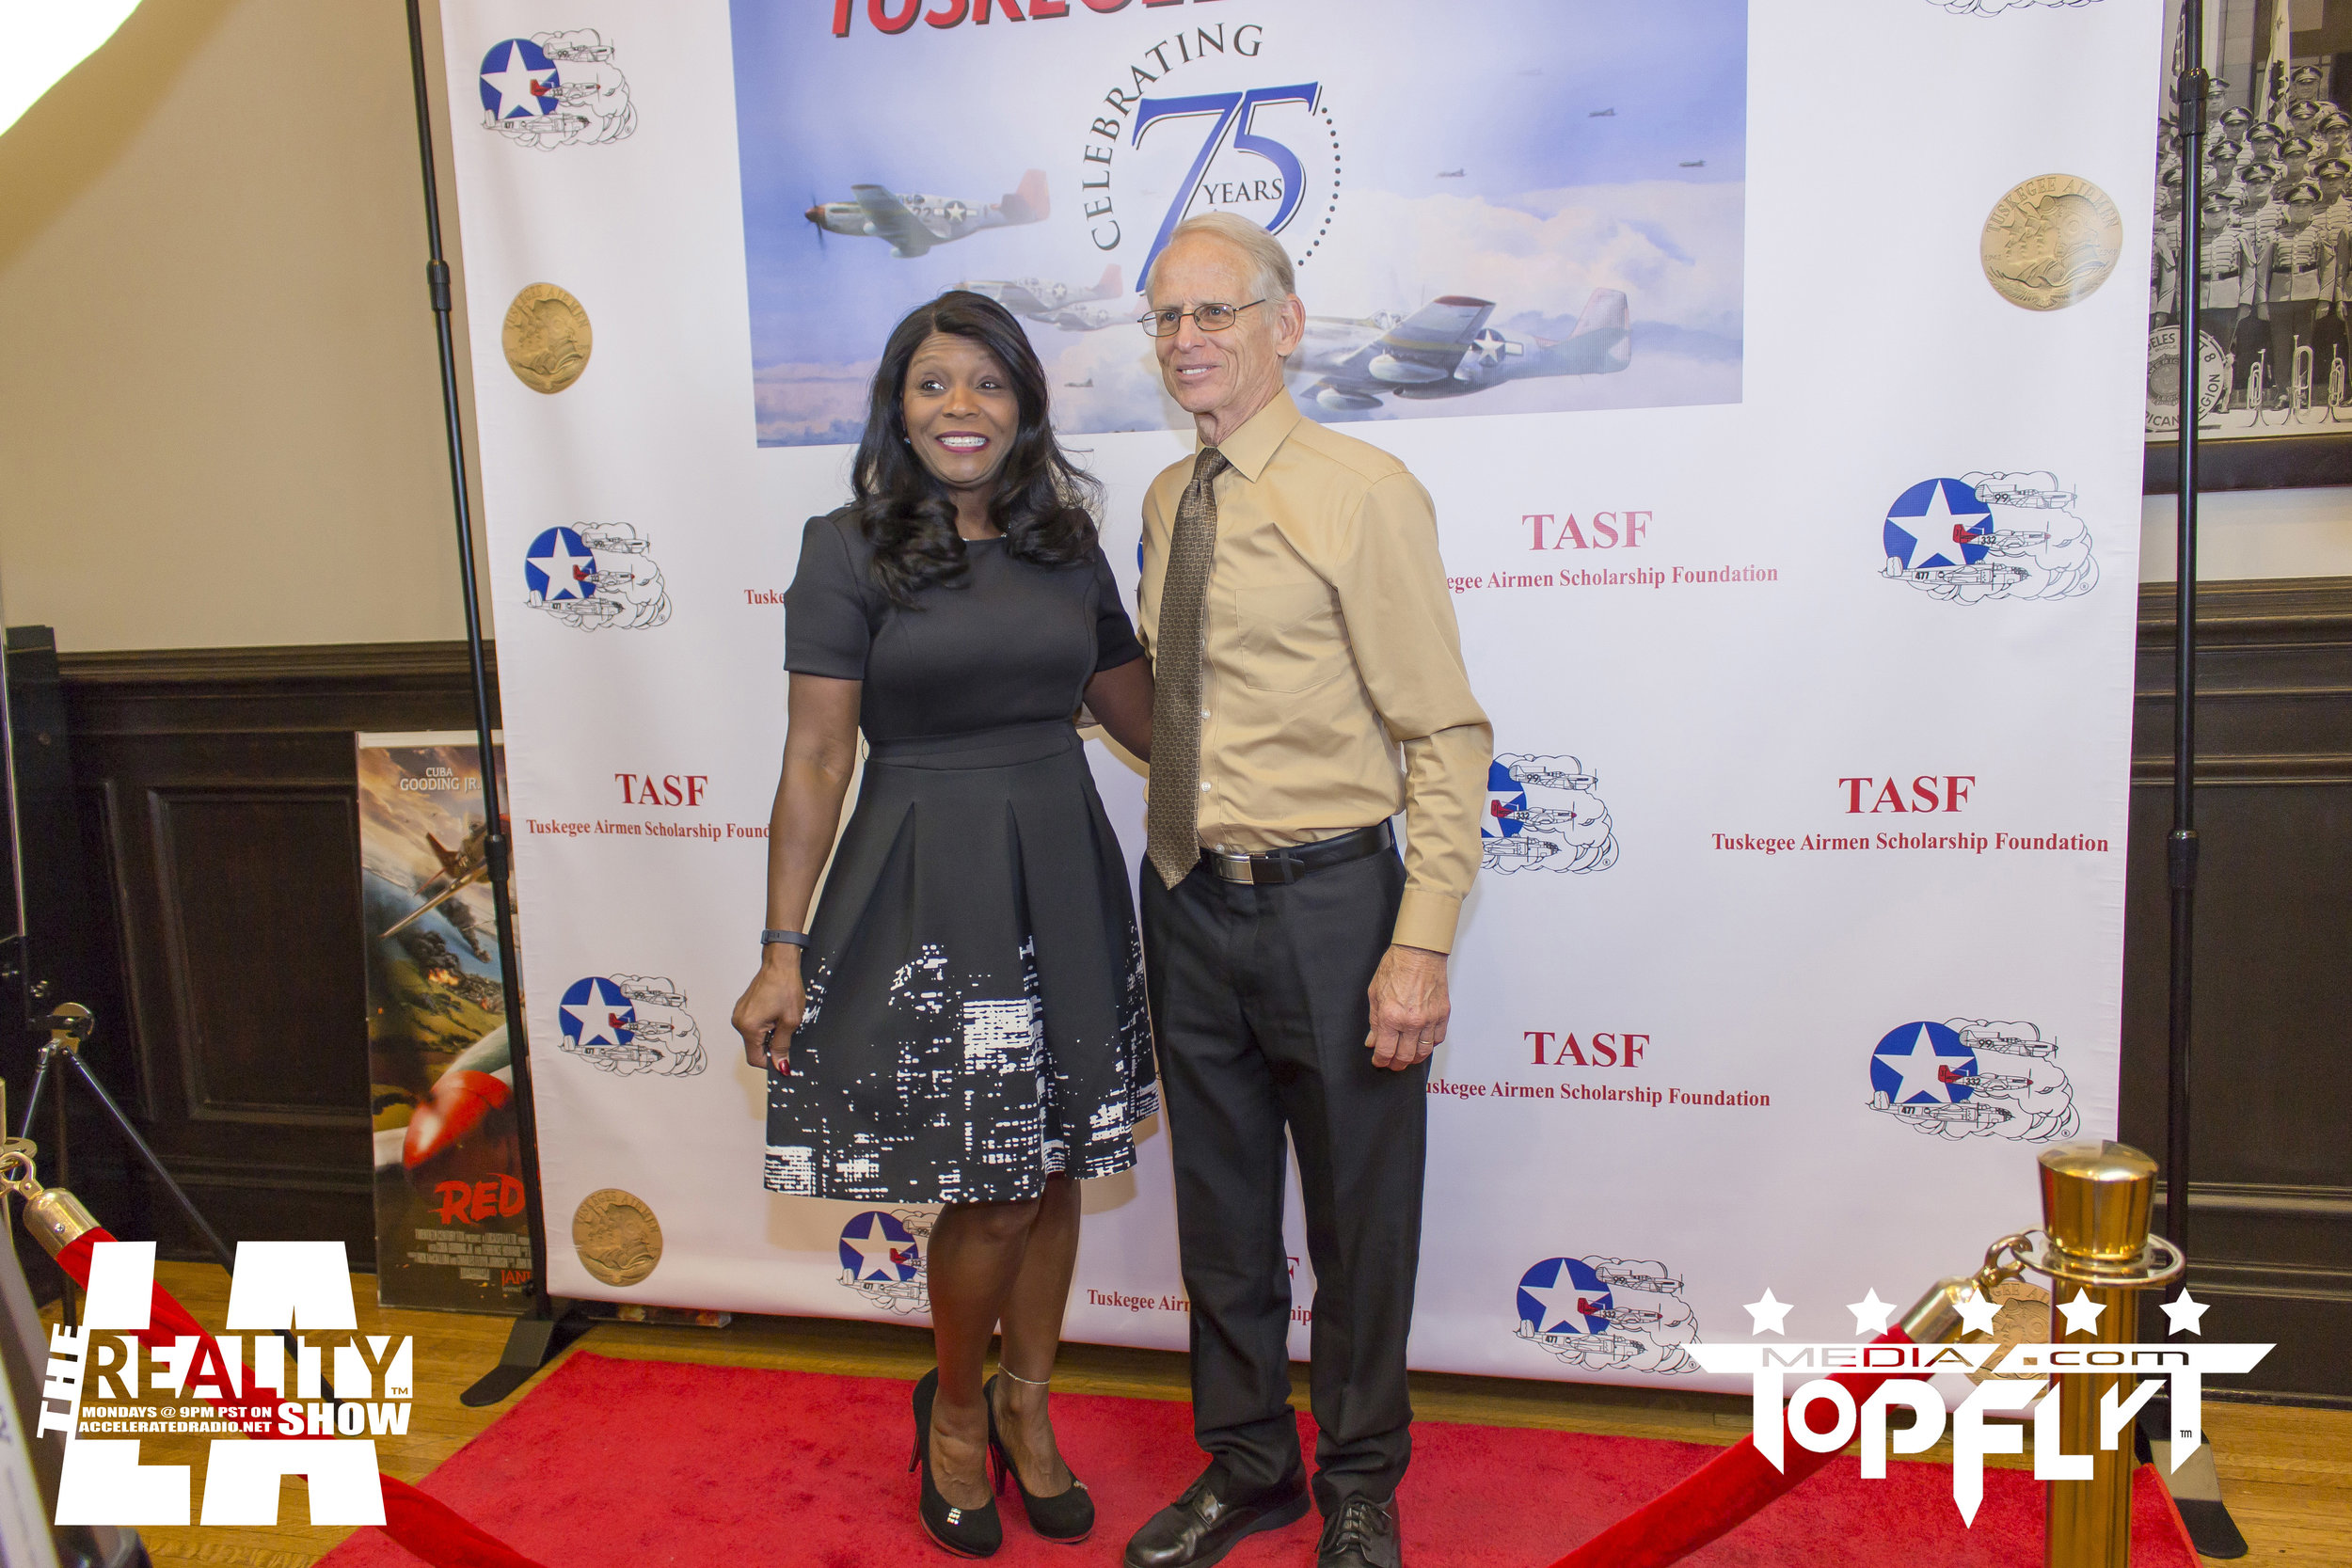 The Reality Show LA - Tuskegee Airmen 75th Anniversary VIP Reception_55.jpg